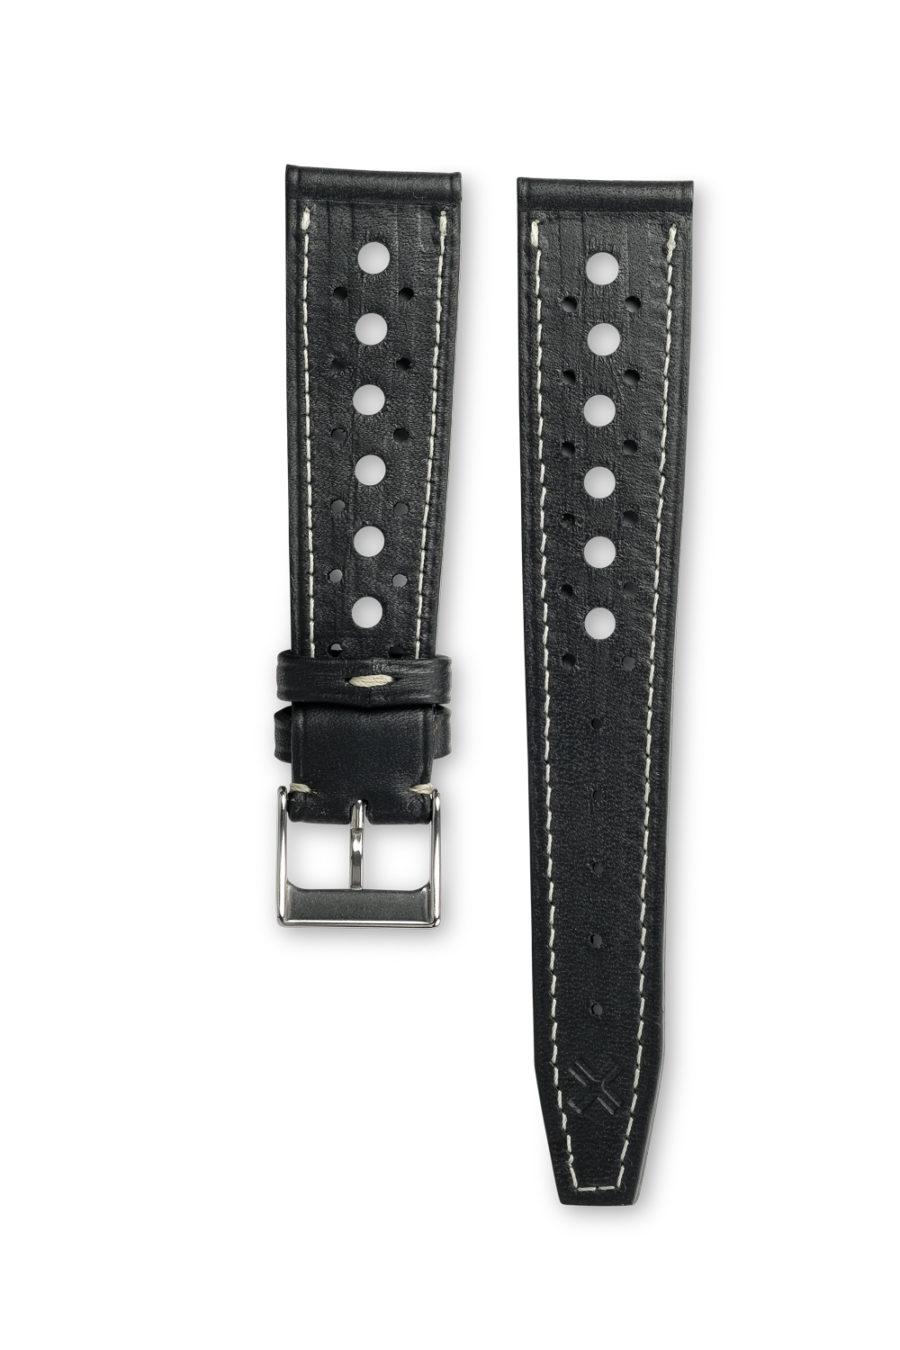 Smooth Rally Barenia deep black leather watch strap - cream stitching - LUGS brand